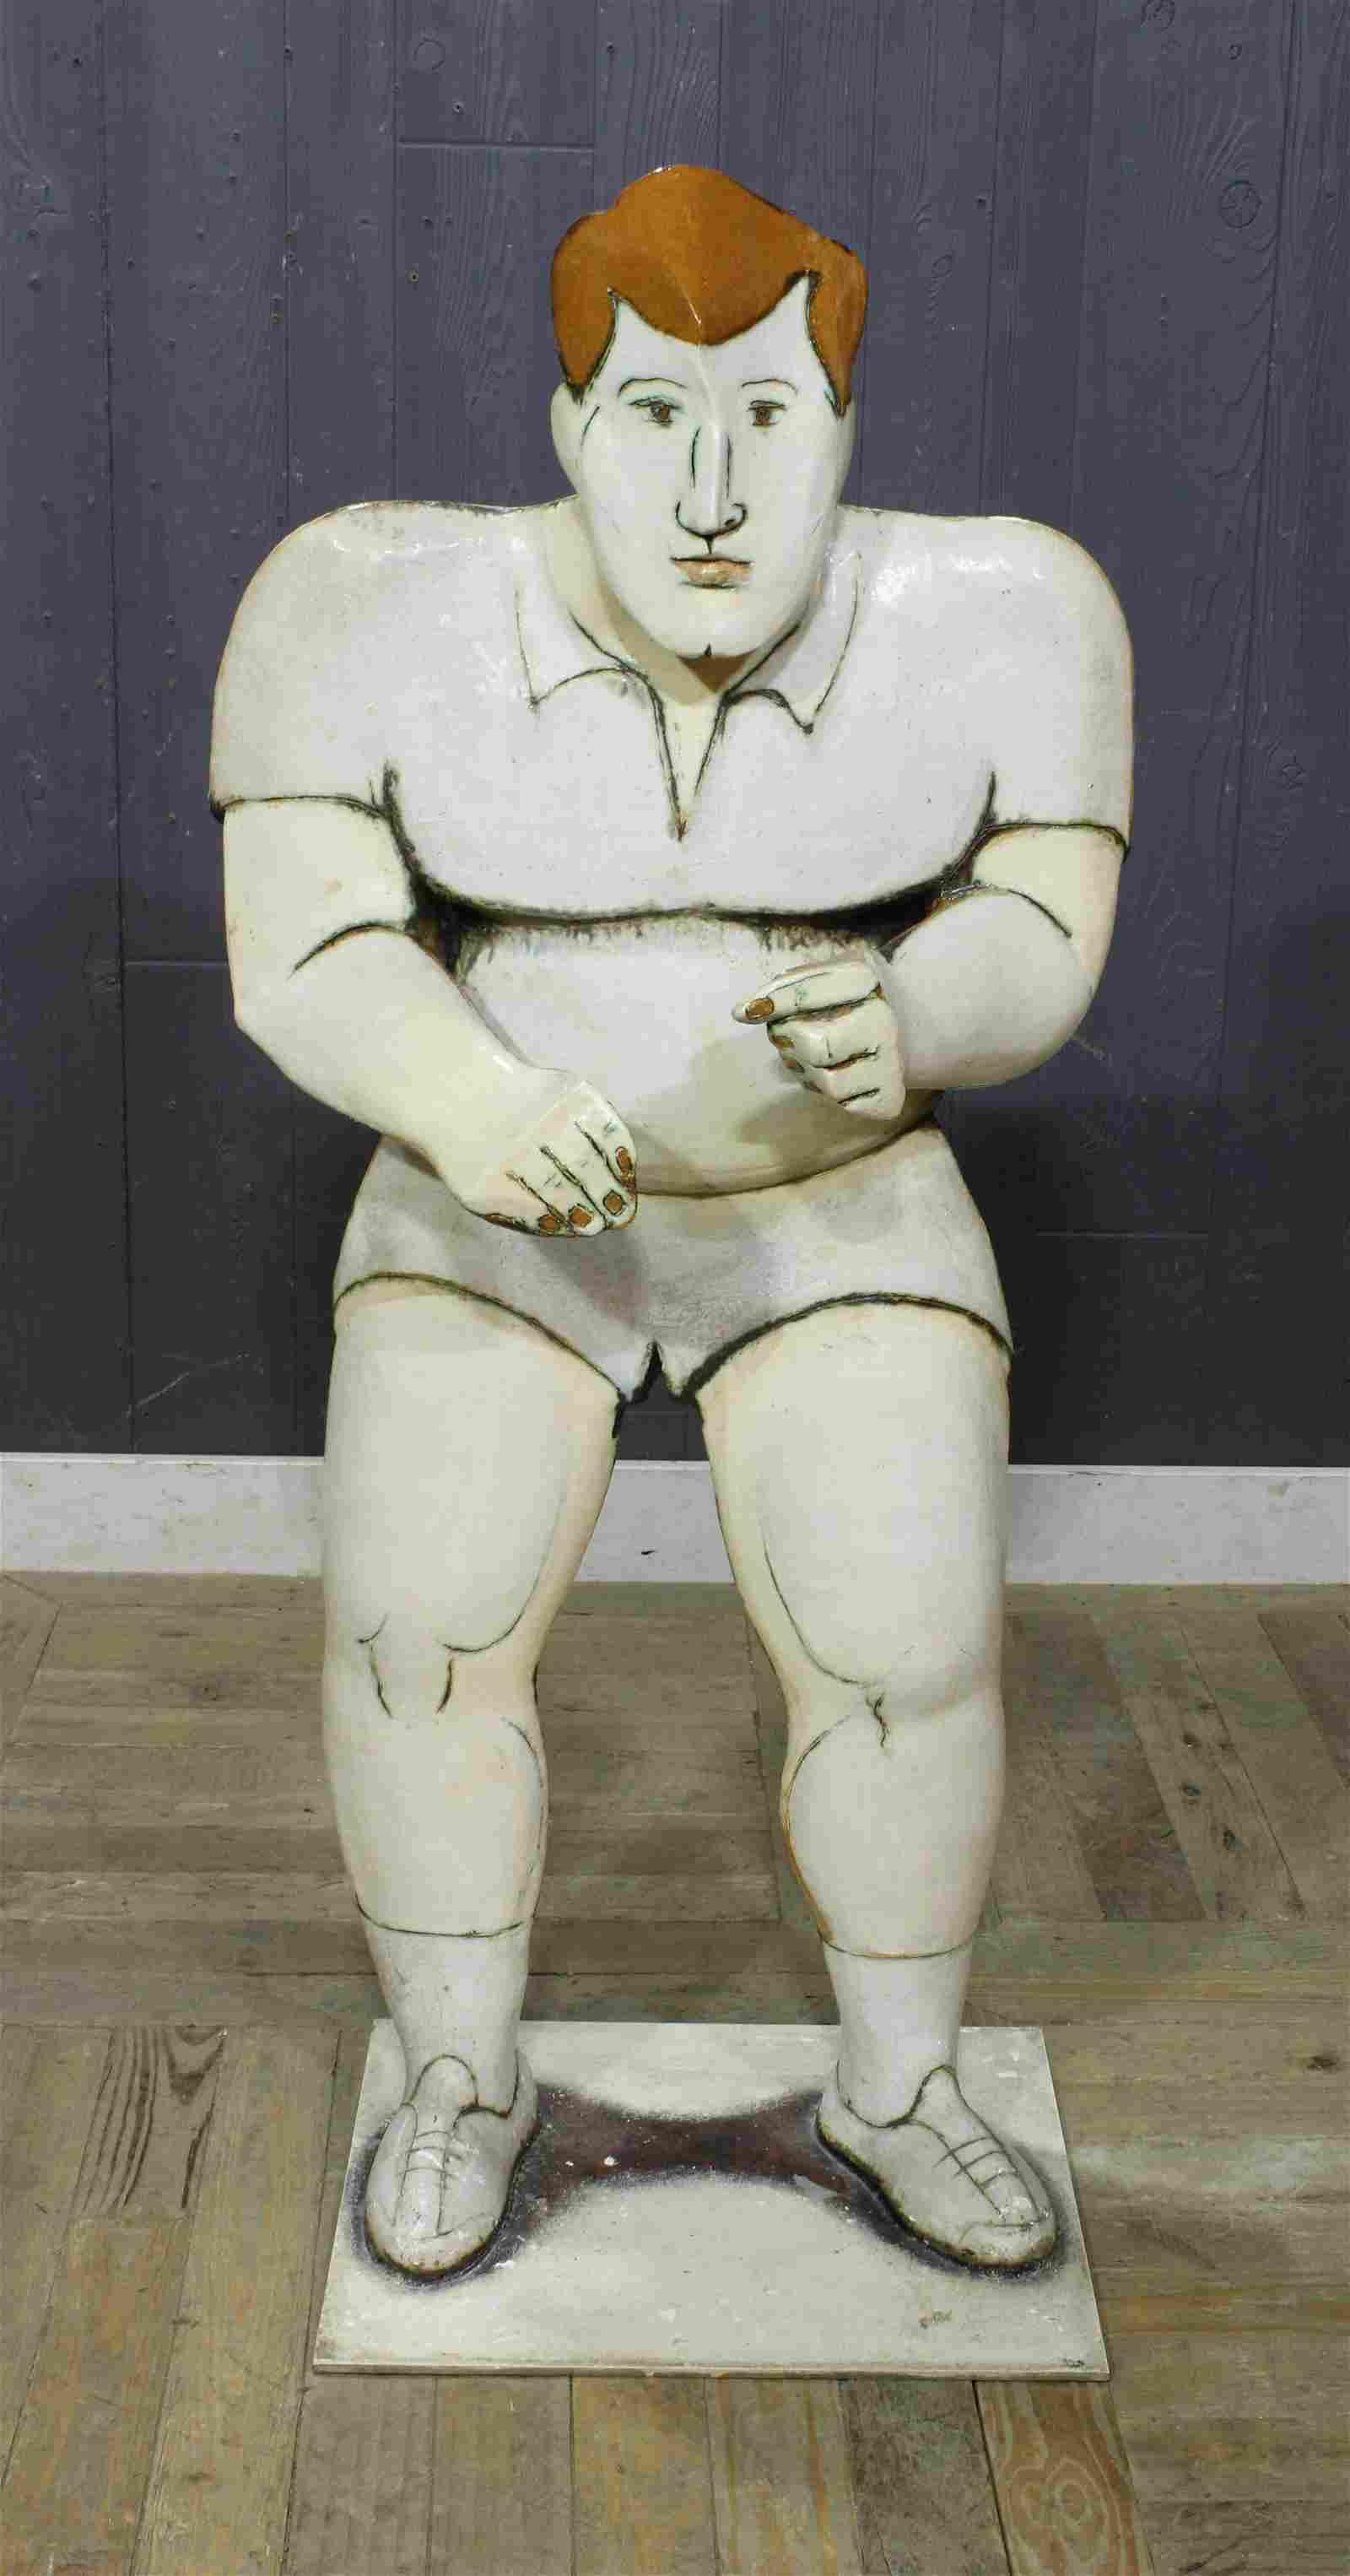 Modernist Glazed Ceramic Sculpture